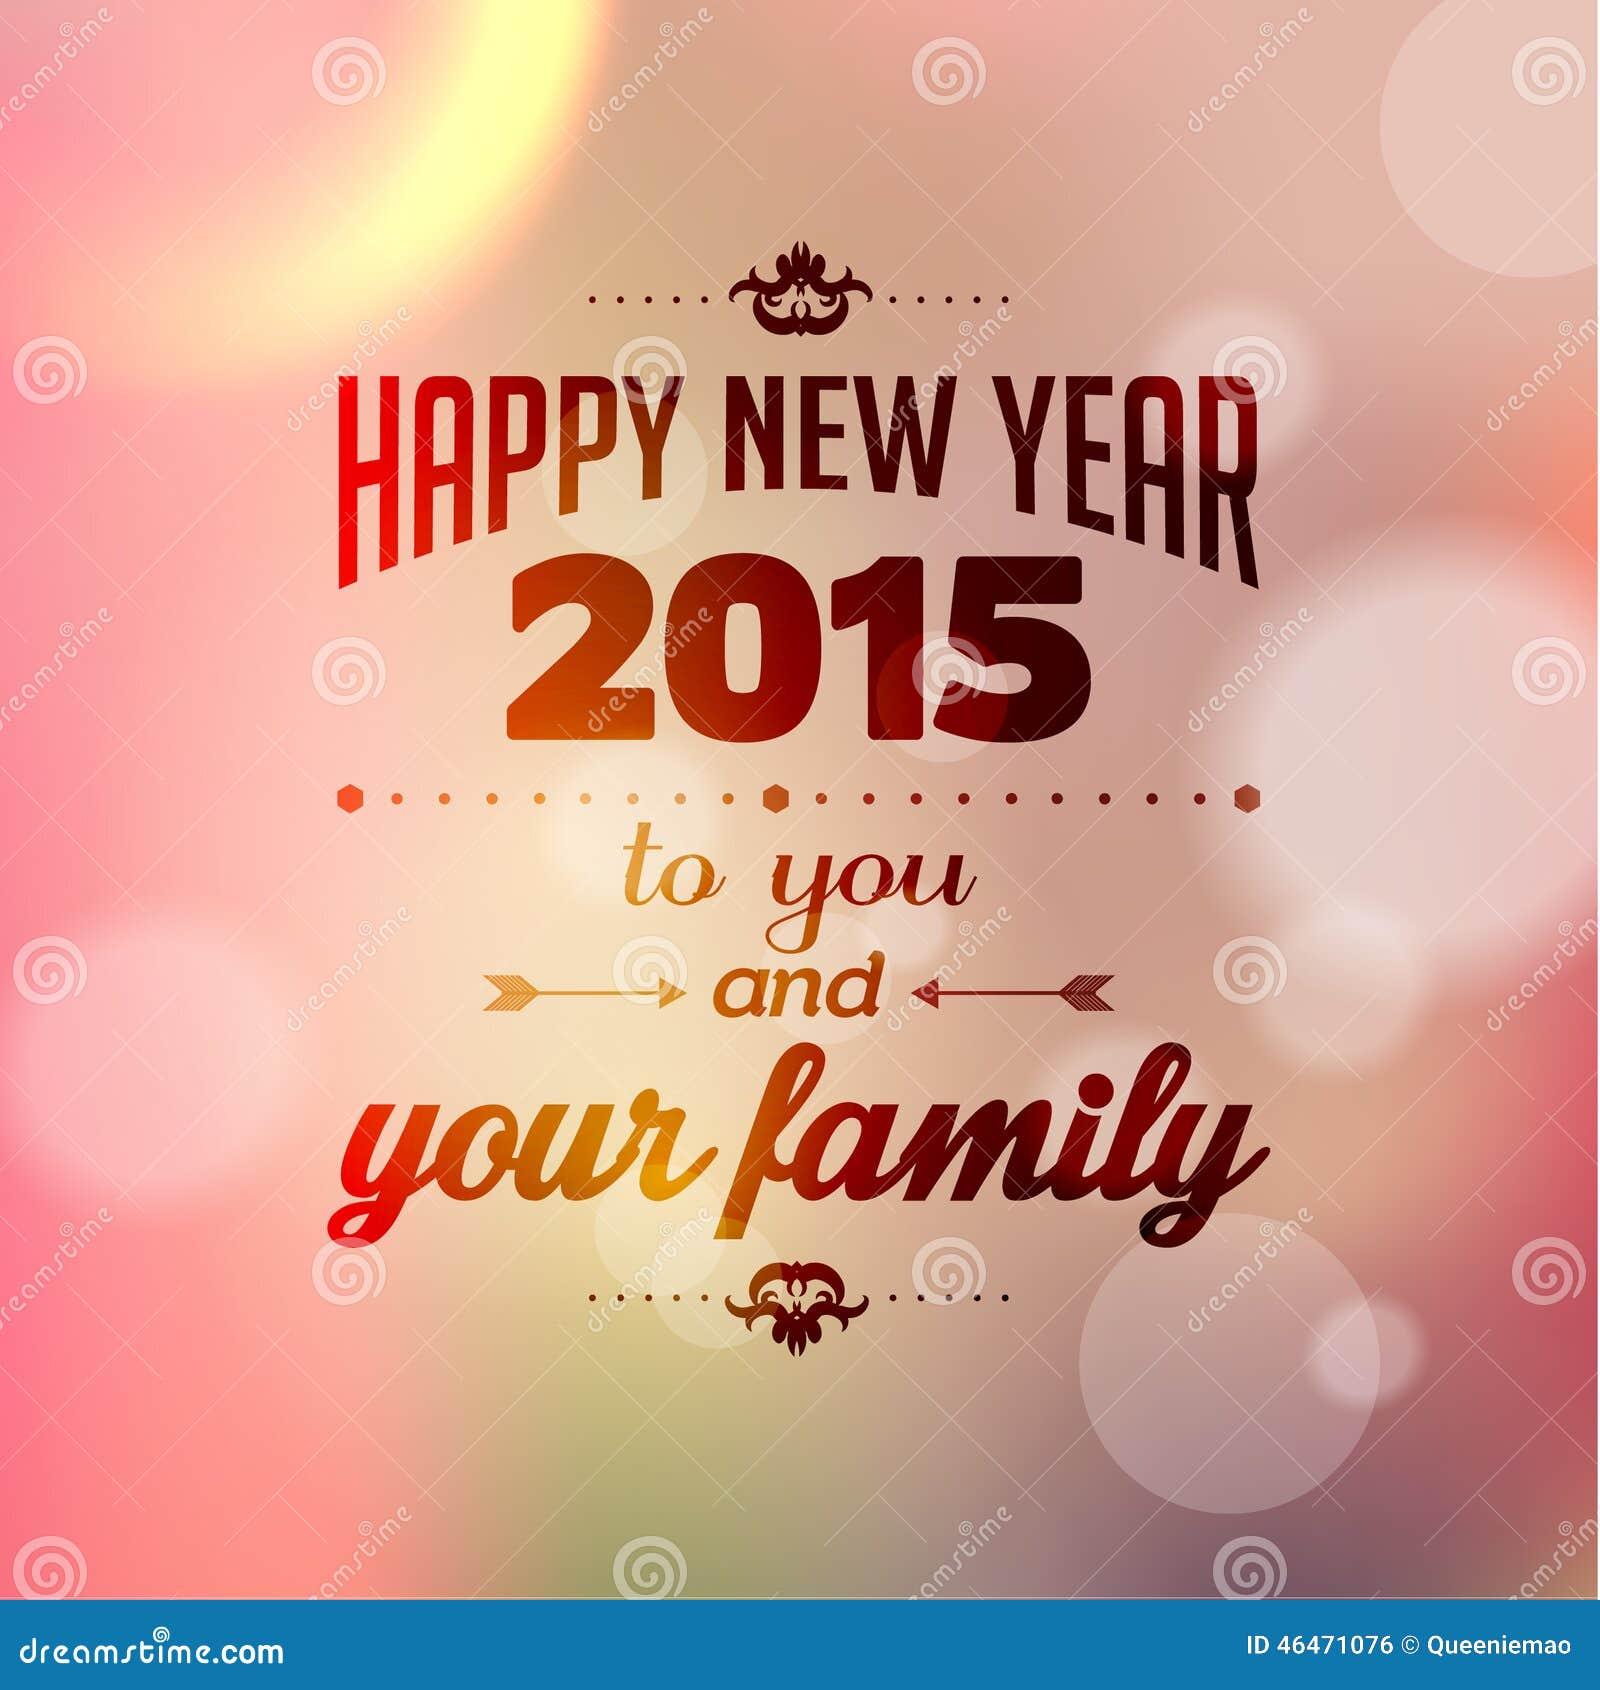 Happy New Year Greetings Vector Design Stock Illustration